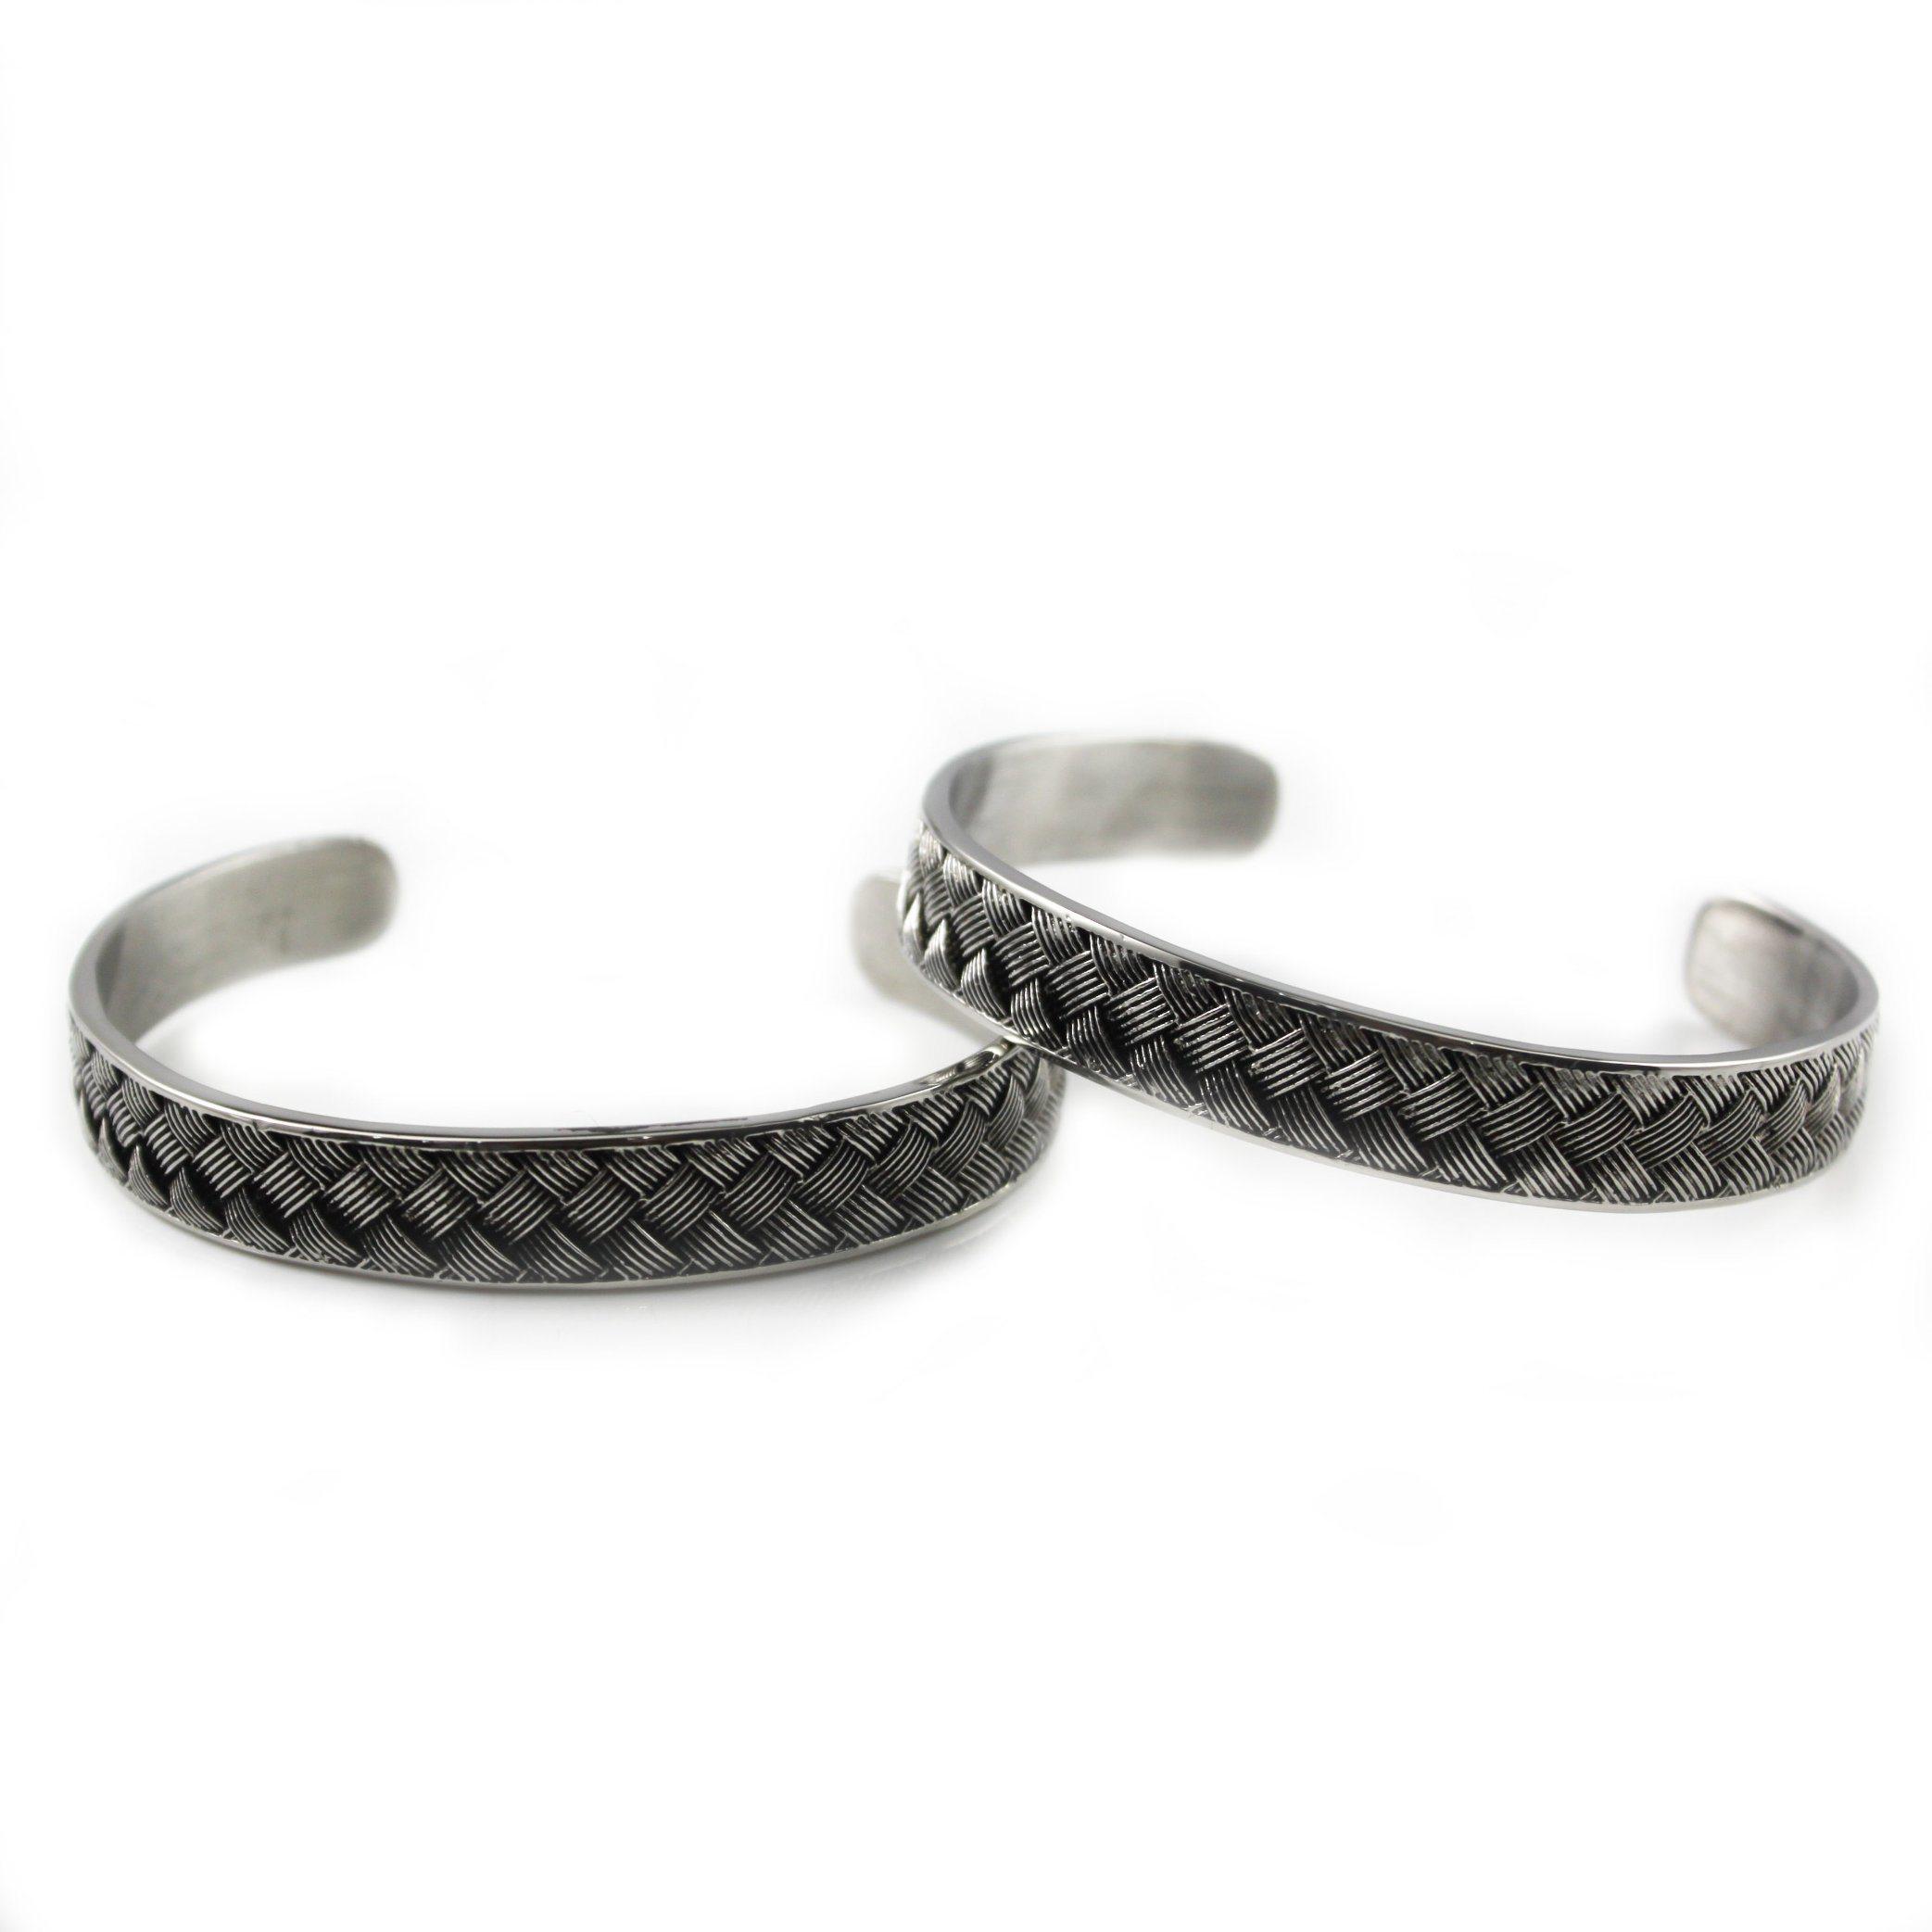 Fashion Nice Quality Stainless Steel Women Popular Bangle Jewelry